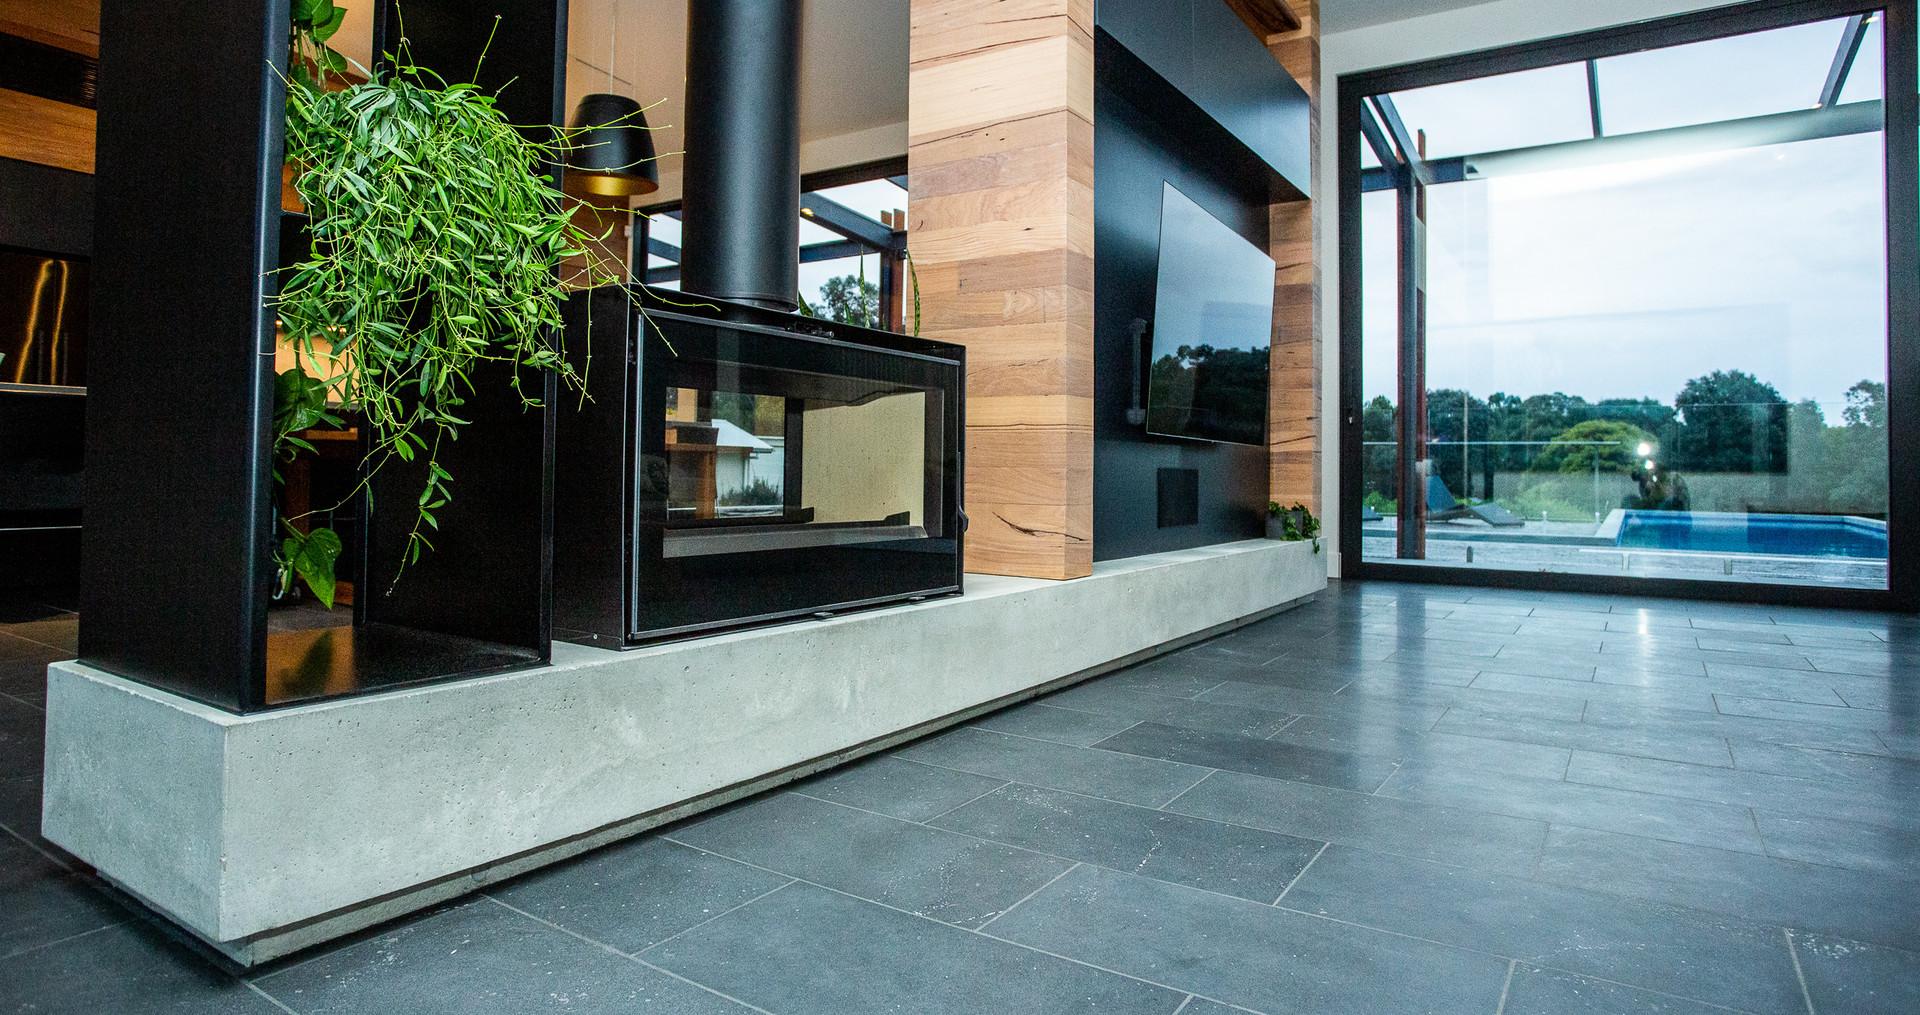 Concrete Fire Hearth Dividing Two Living Spaces